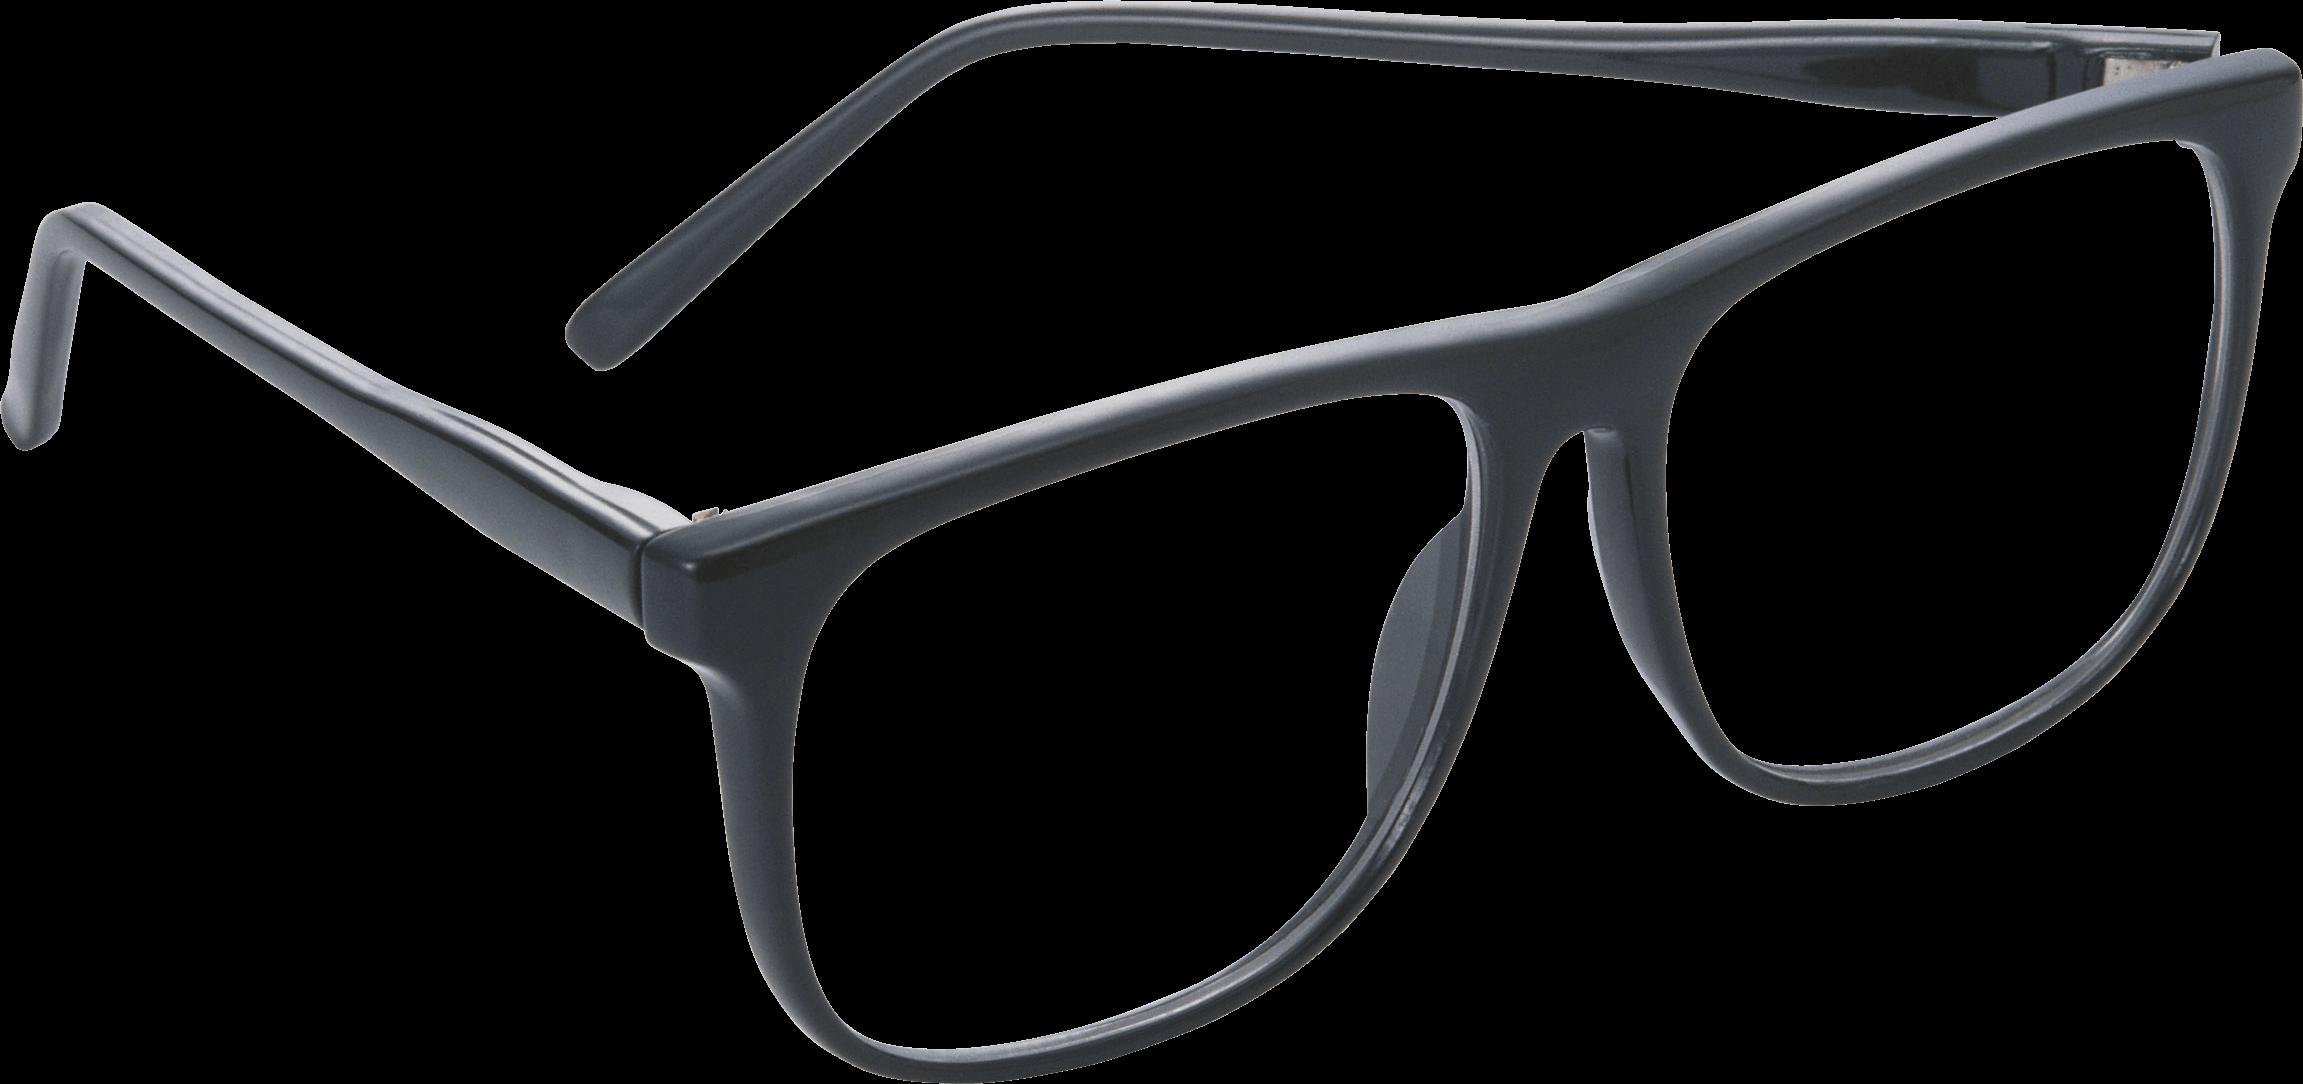 Sunglasses clipart side view.  d movie glasses